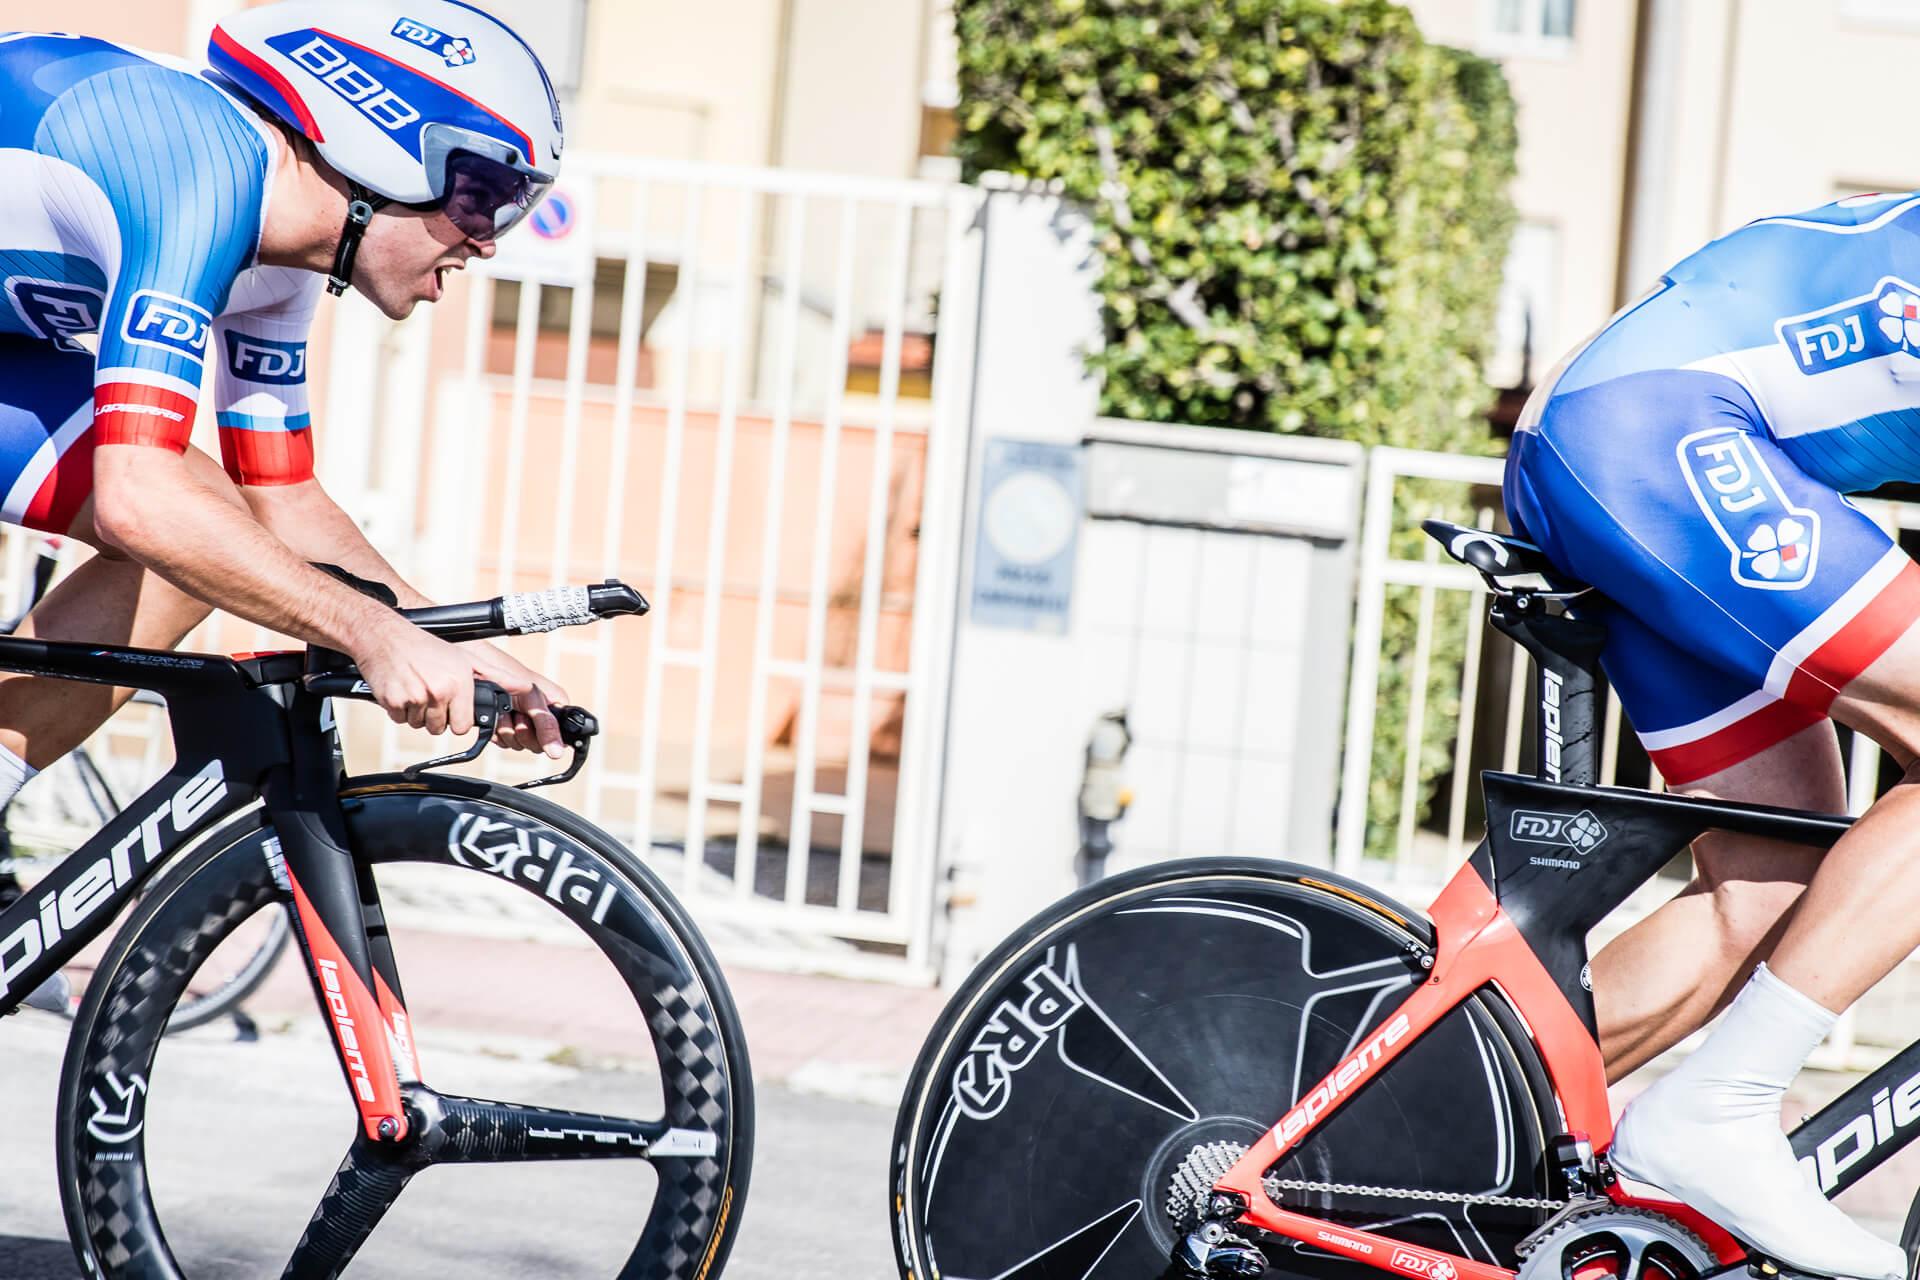 TT FDJ Tirreno-Adriatico